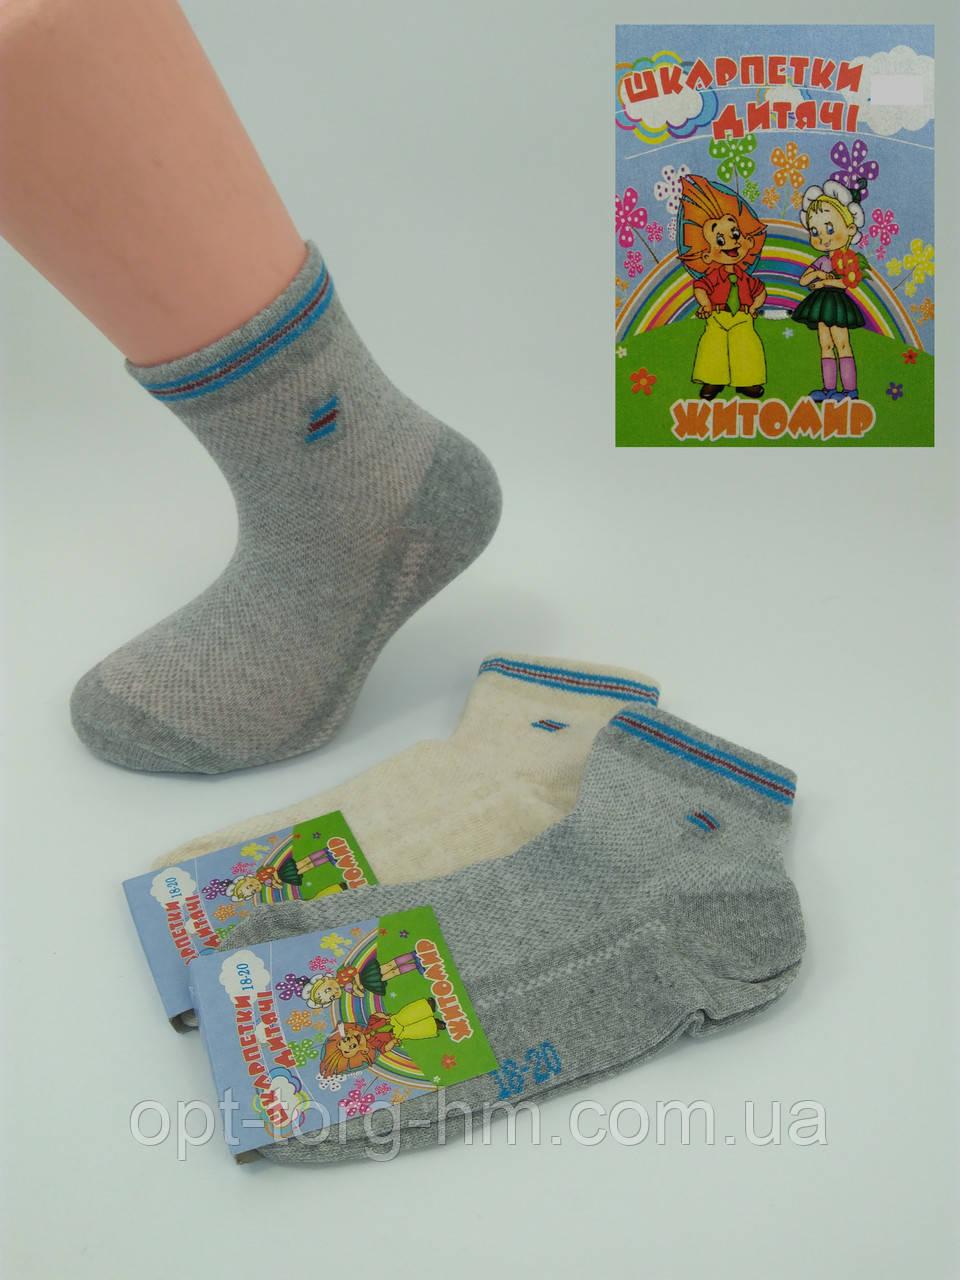 Детские носки сетка 18-20 (28-31обувь)